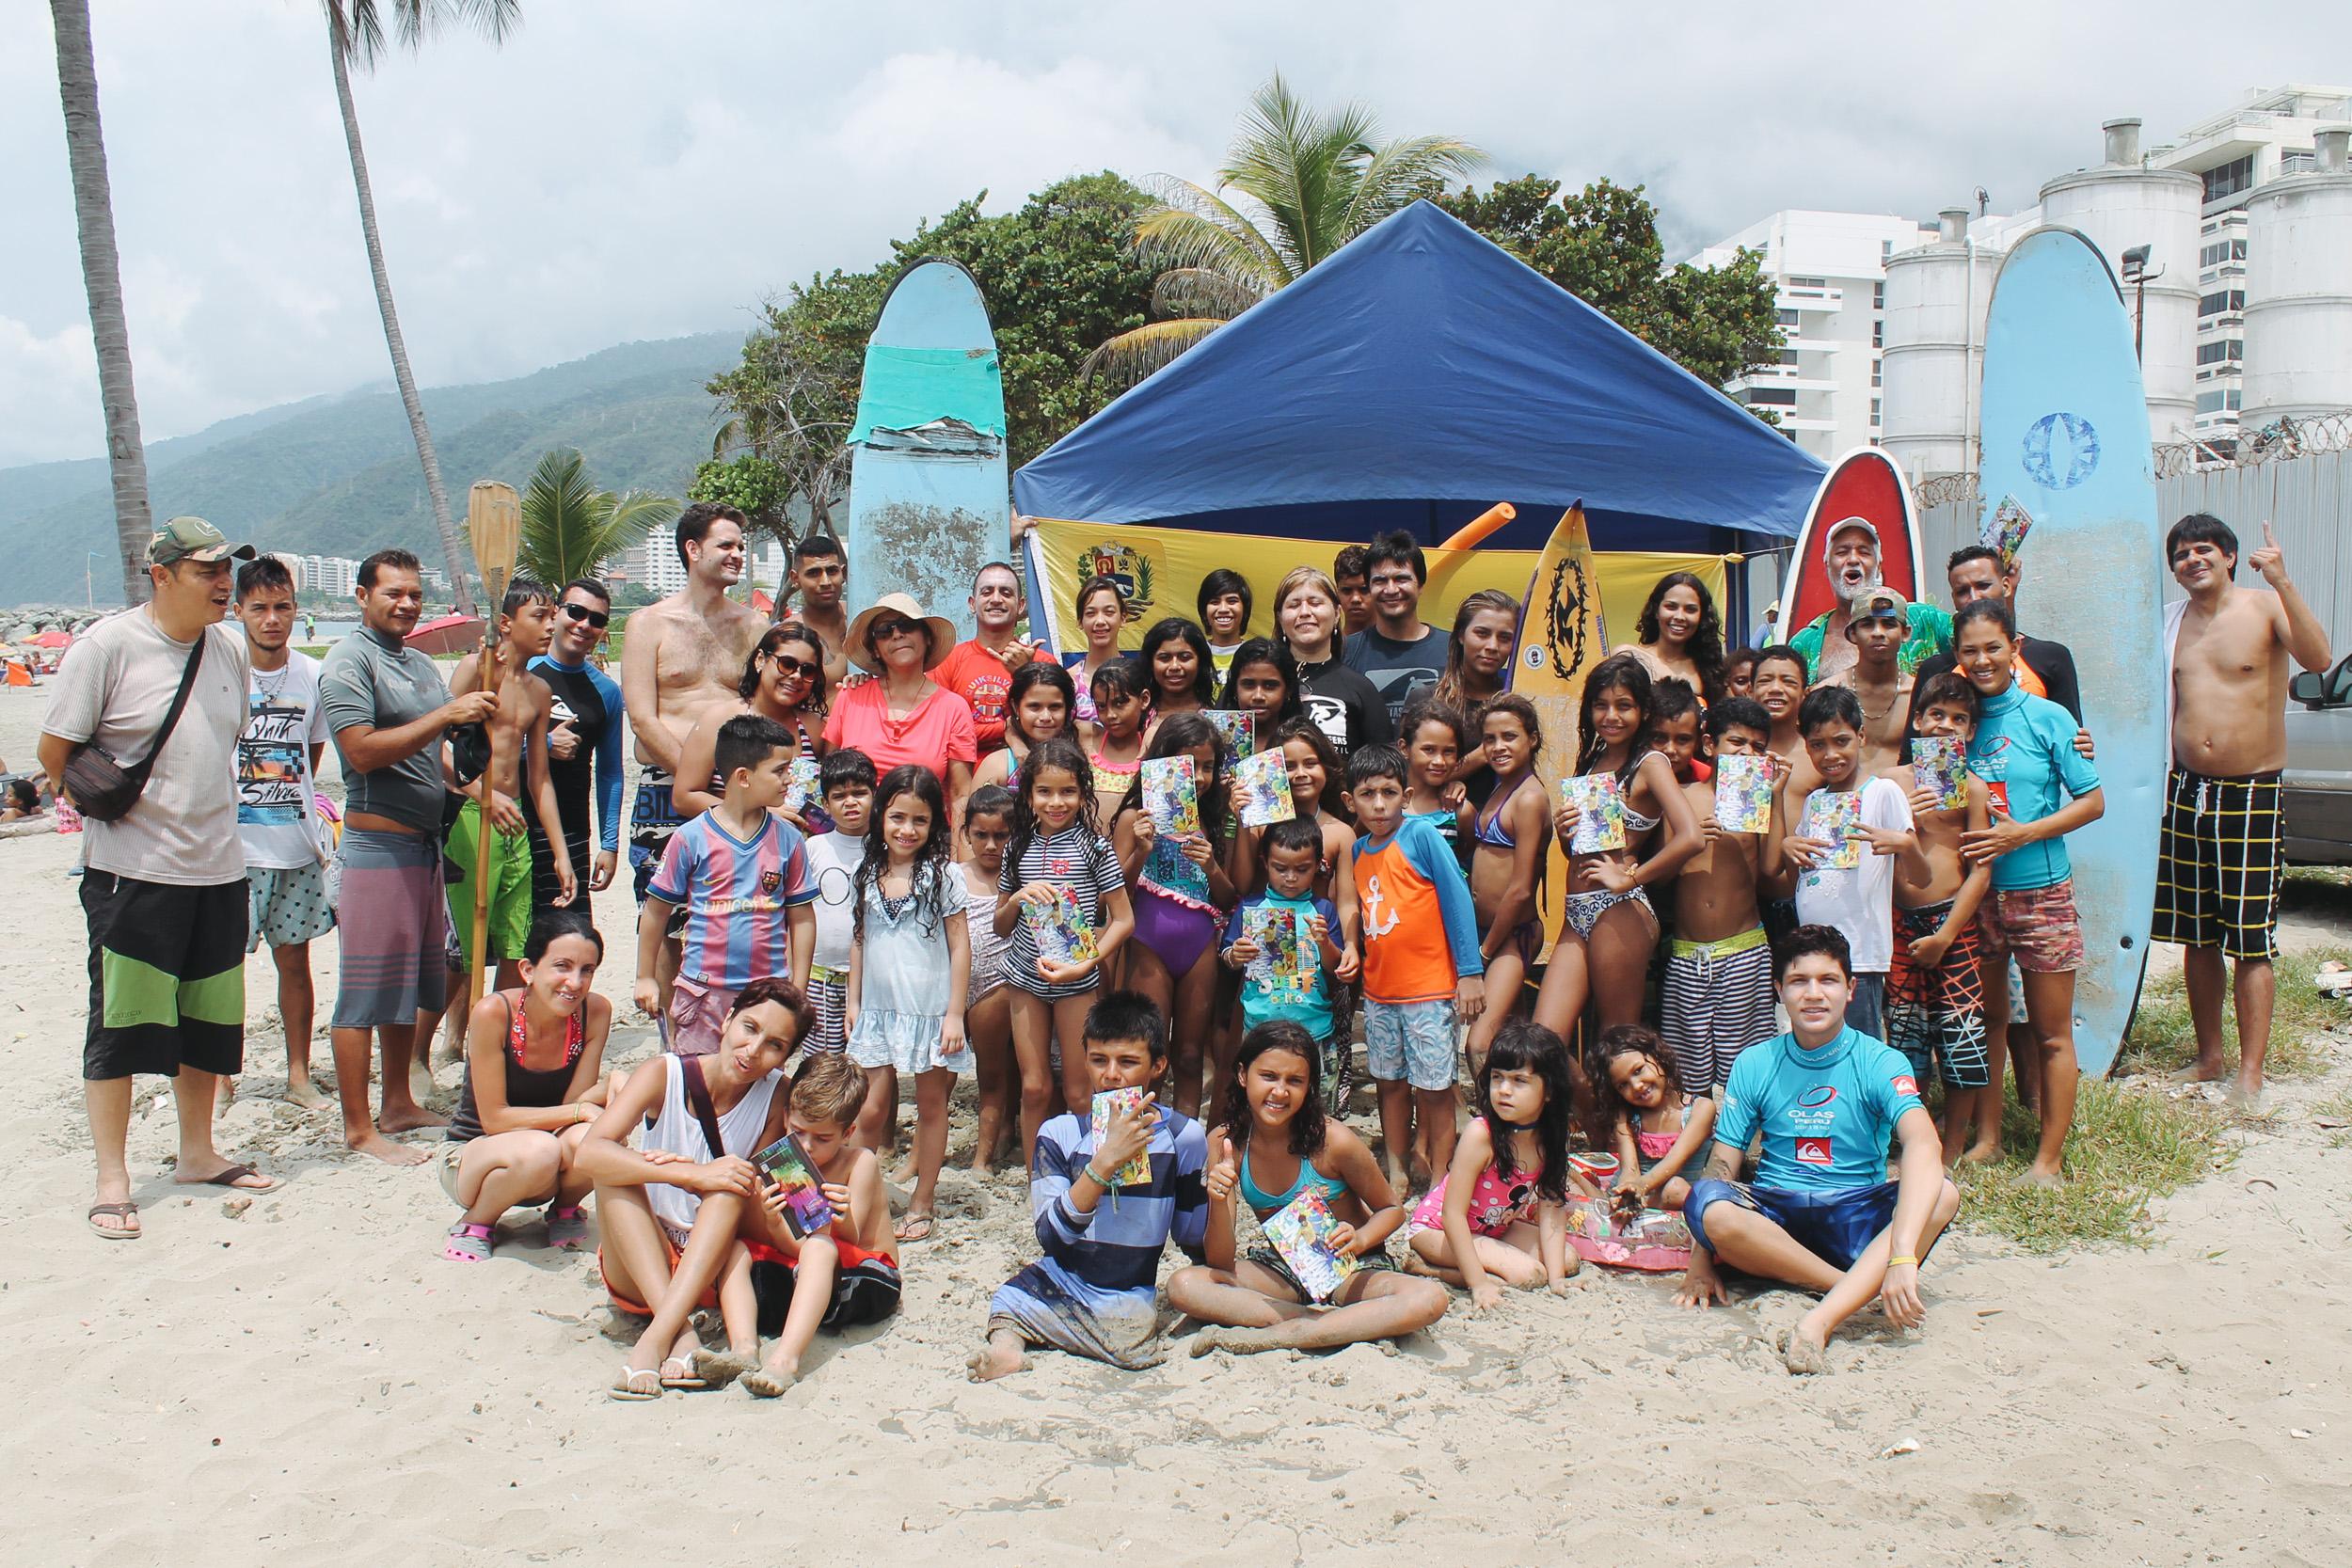 Christian-Surfers-Venezuela-1.jpg